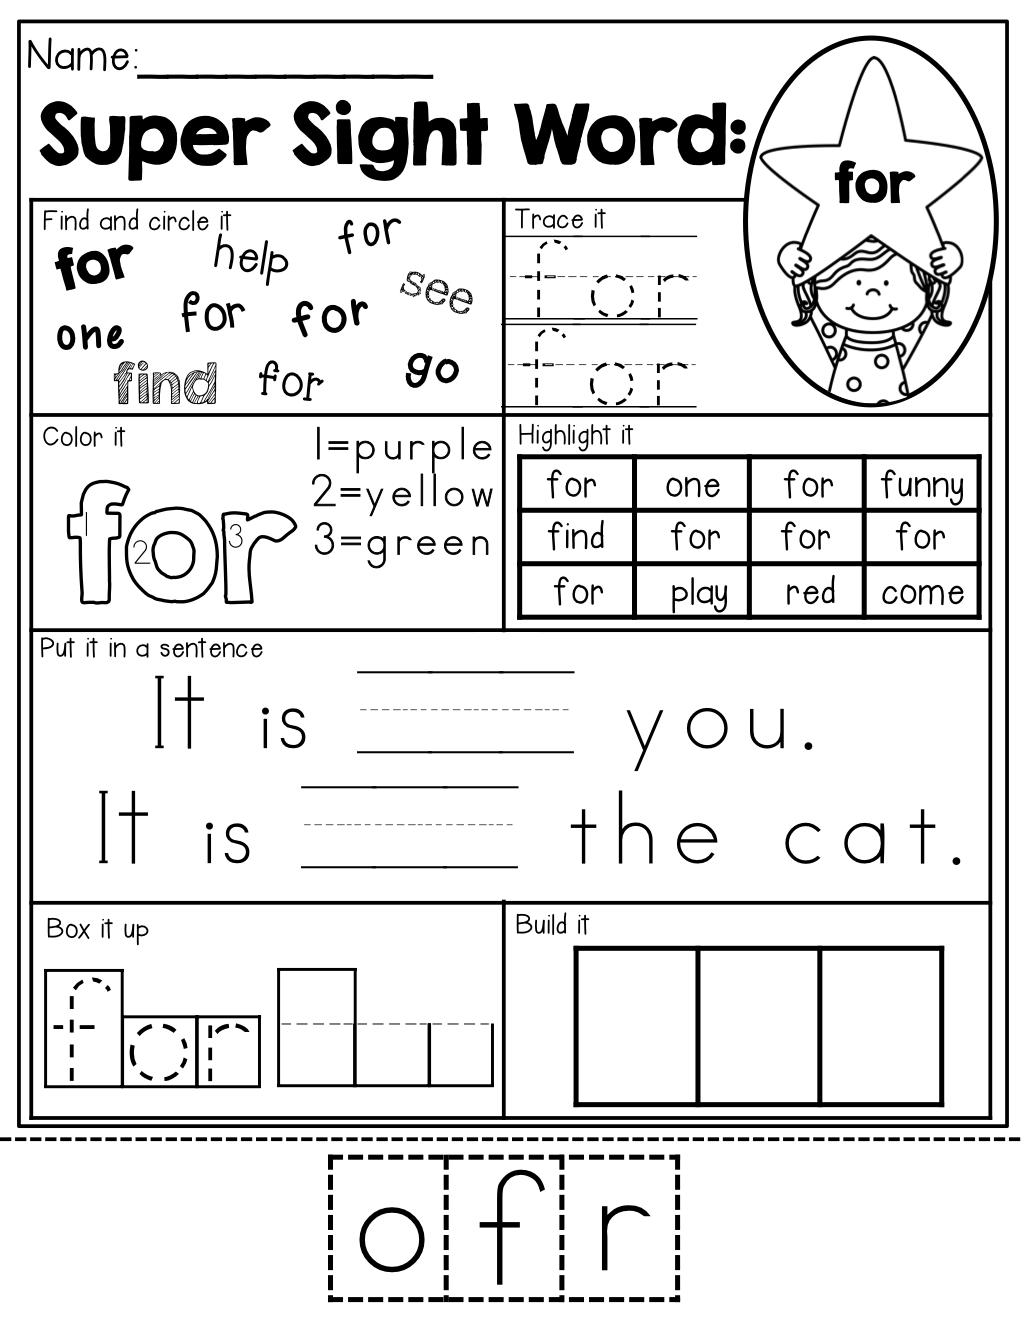 Activities Preprimer Students Edition Master Sight Words Stars Super Prep M Kindergarten Worksheets Sight Words Sight Words Kindergarten Sight Words [ 1325 x 1024 Pixel ]